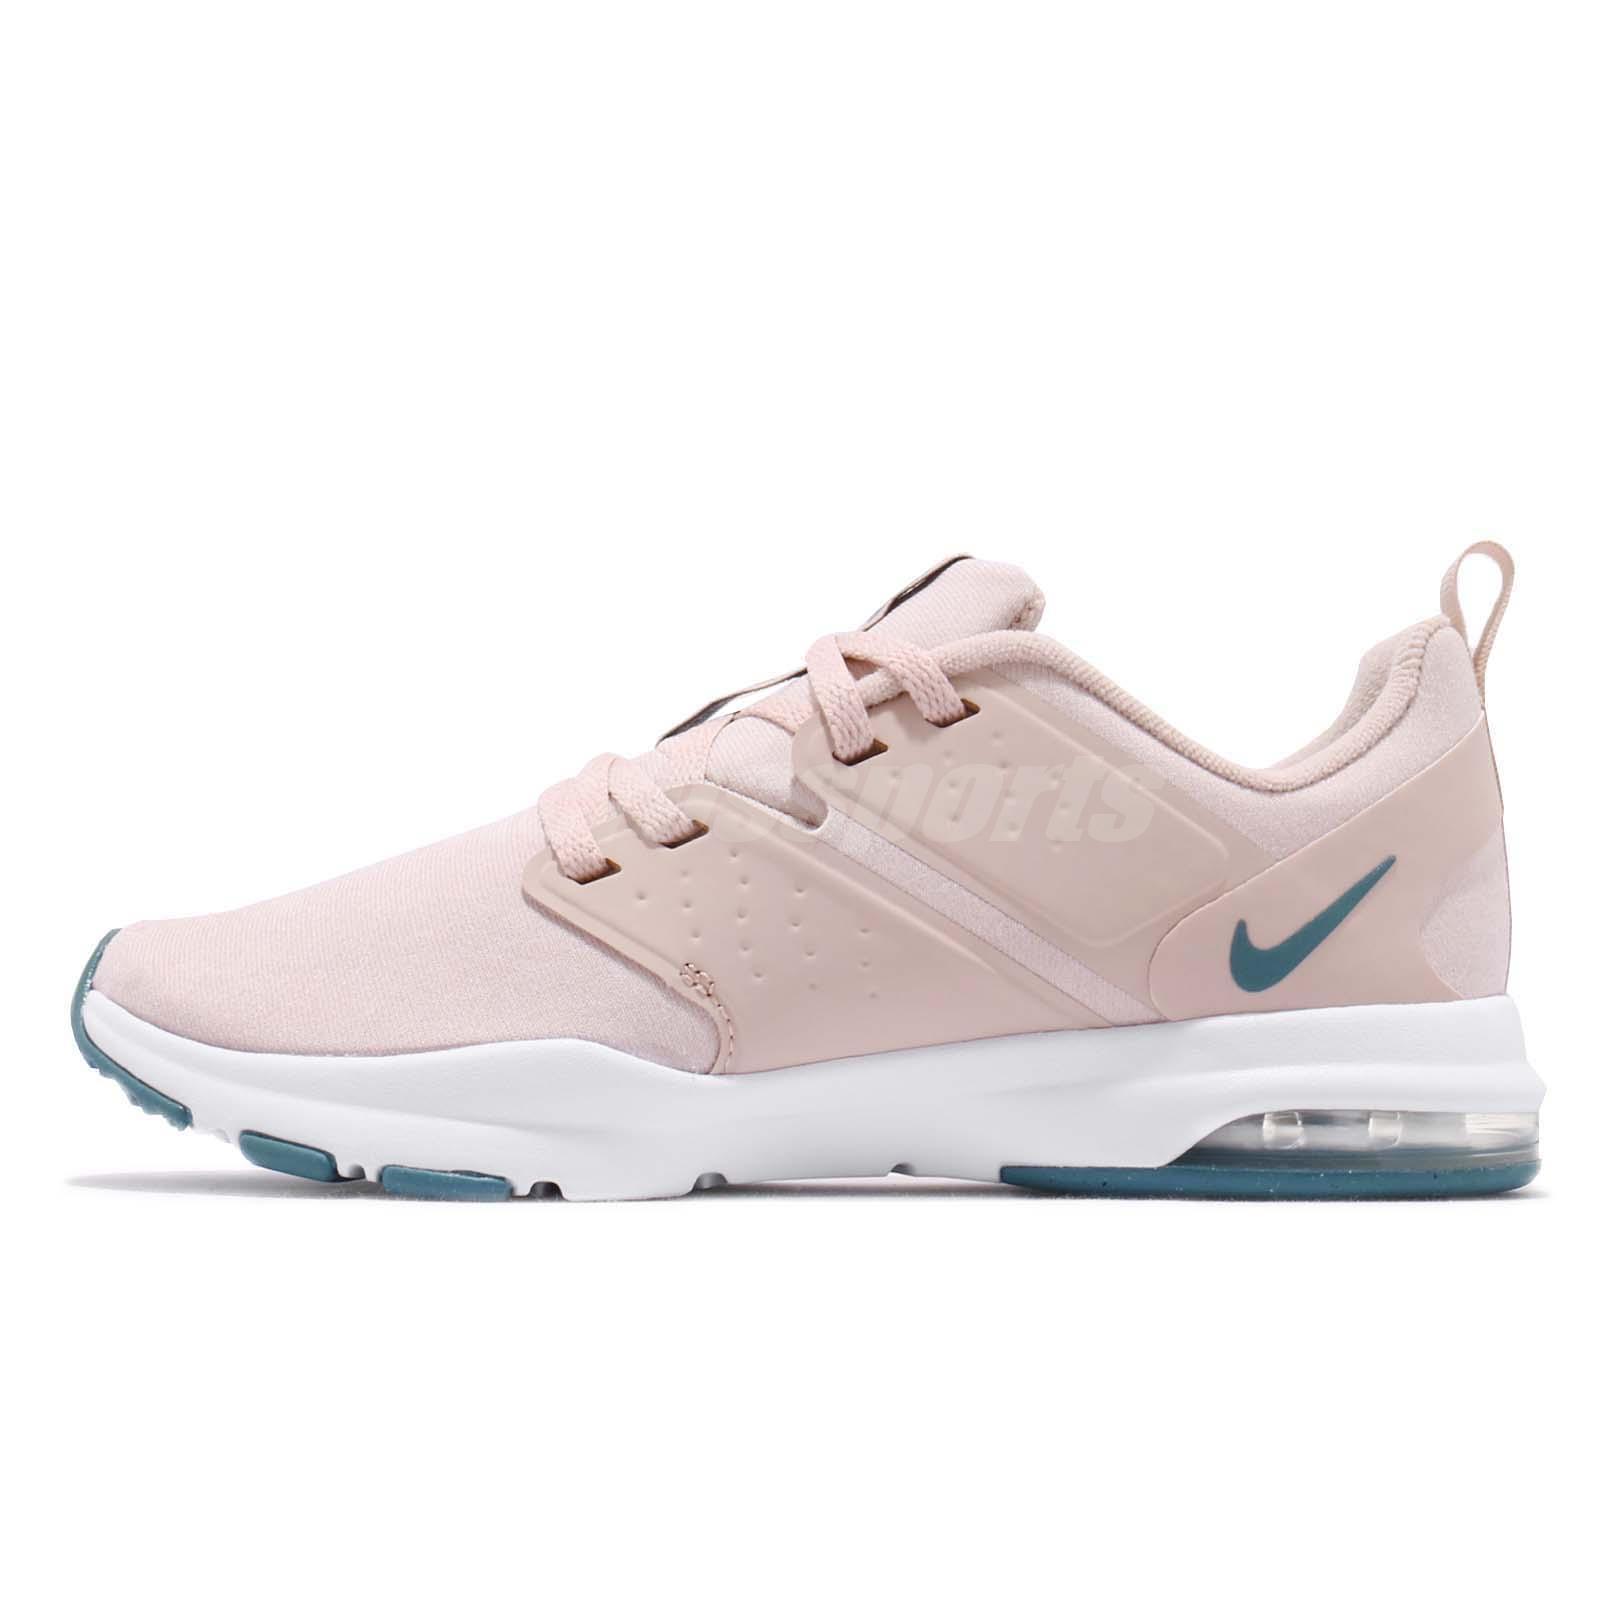 Nike Wmns Air Bella TR Particle Beige Women Cross Training Shoes 924338-200 6997a382dcc4b